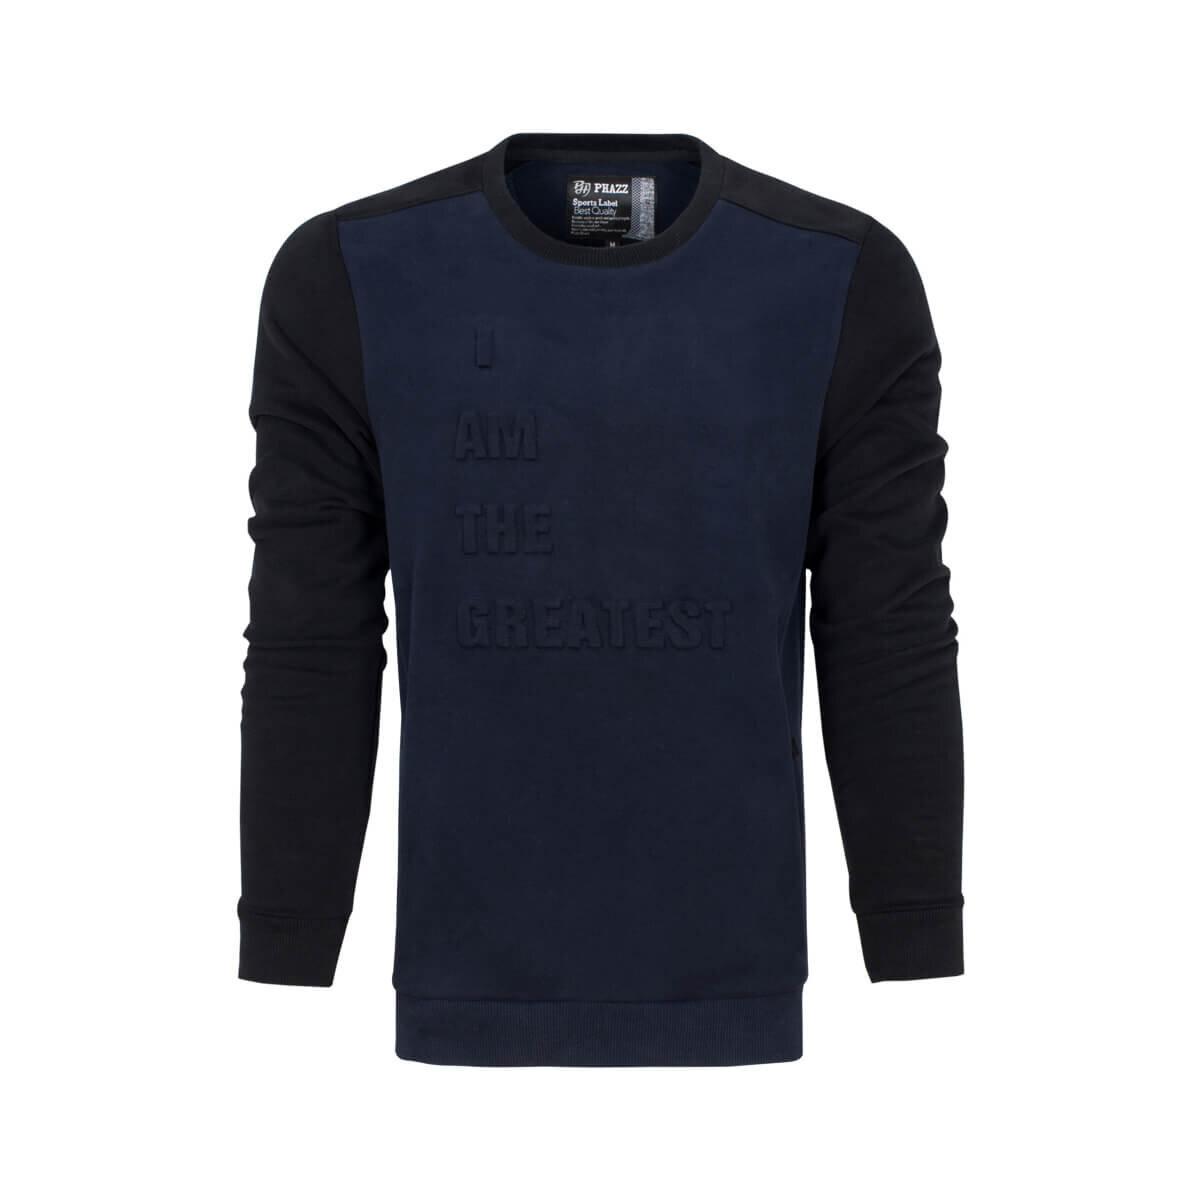 Lacivert Erkek Sweatshirt 85312 SW